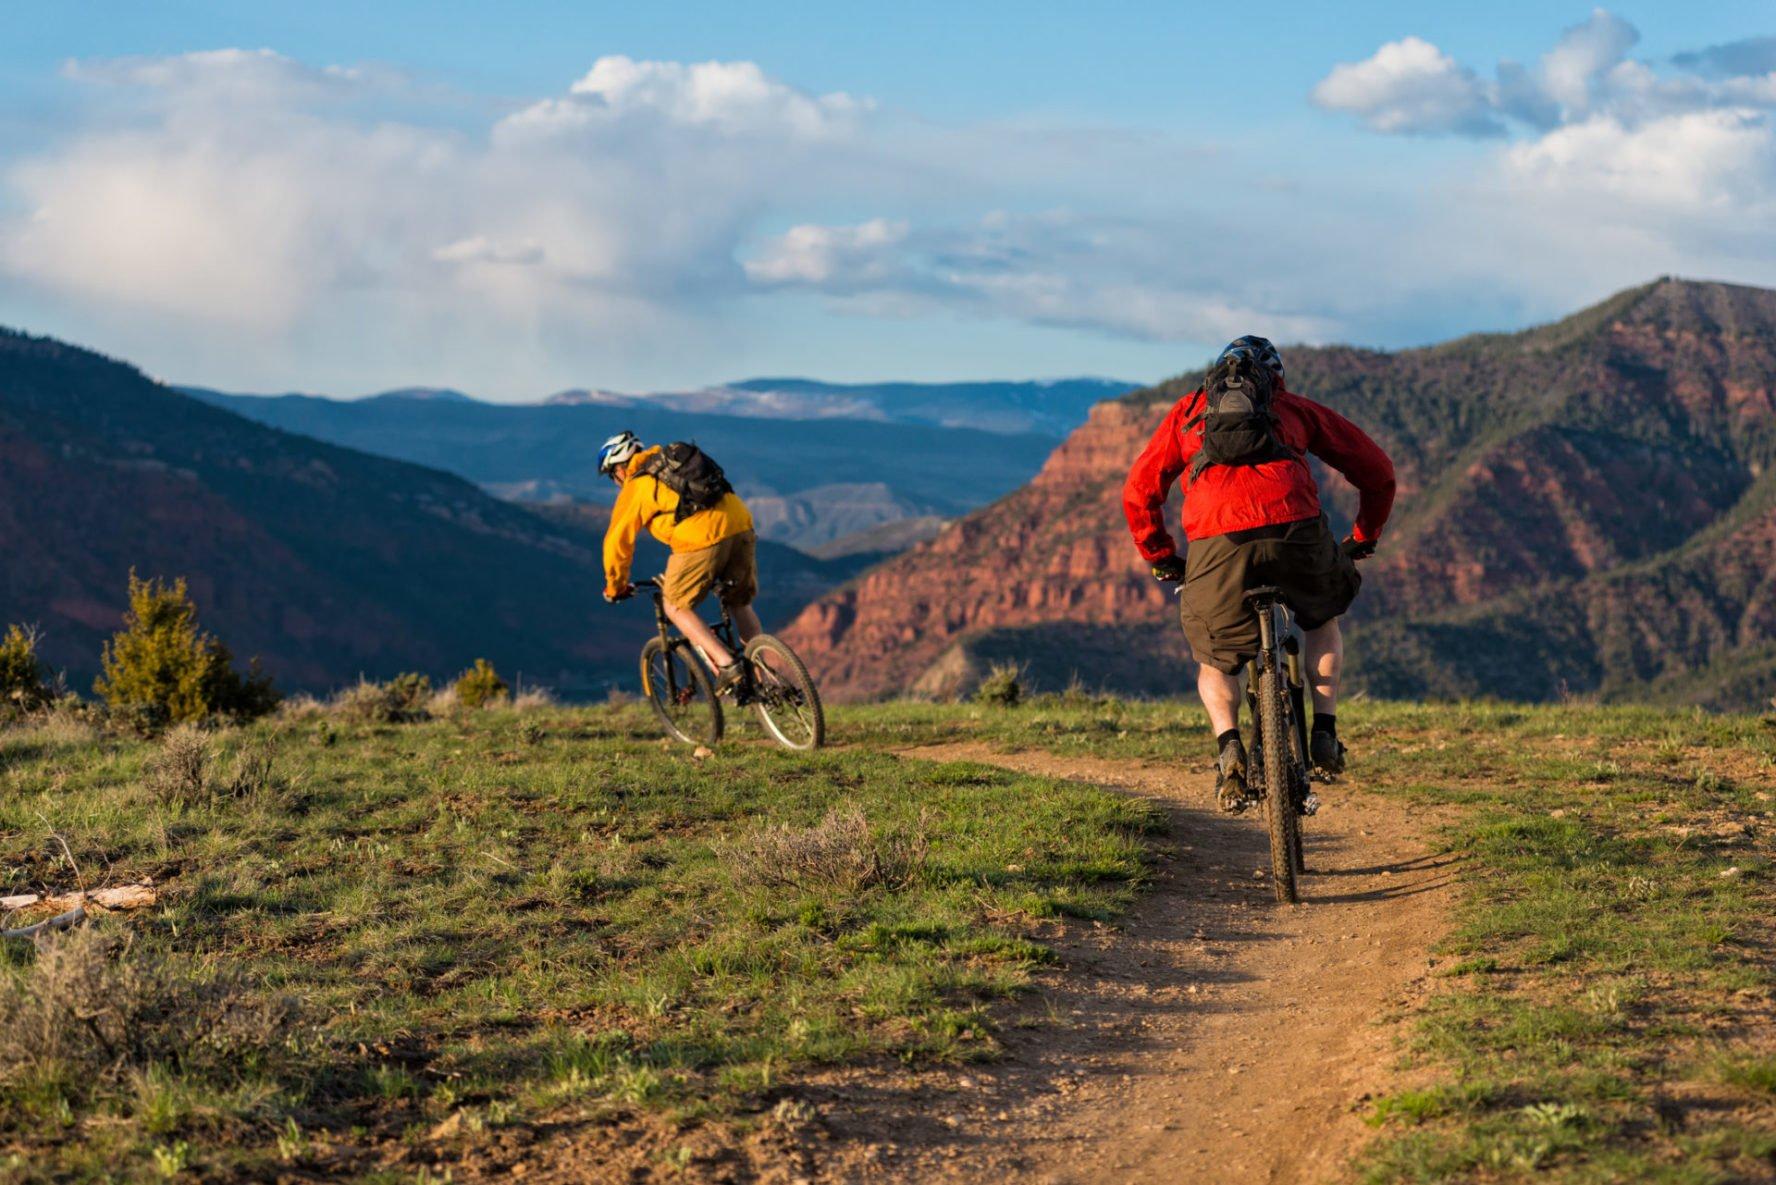 Singletrack mountain biking in Colorado